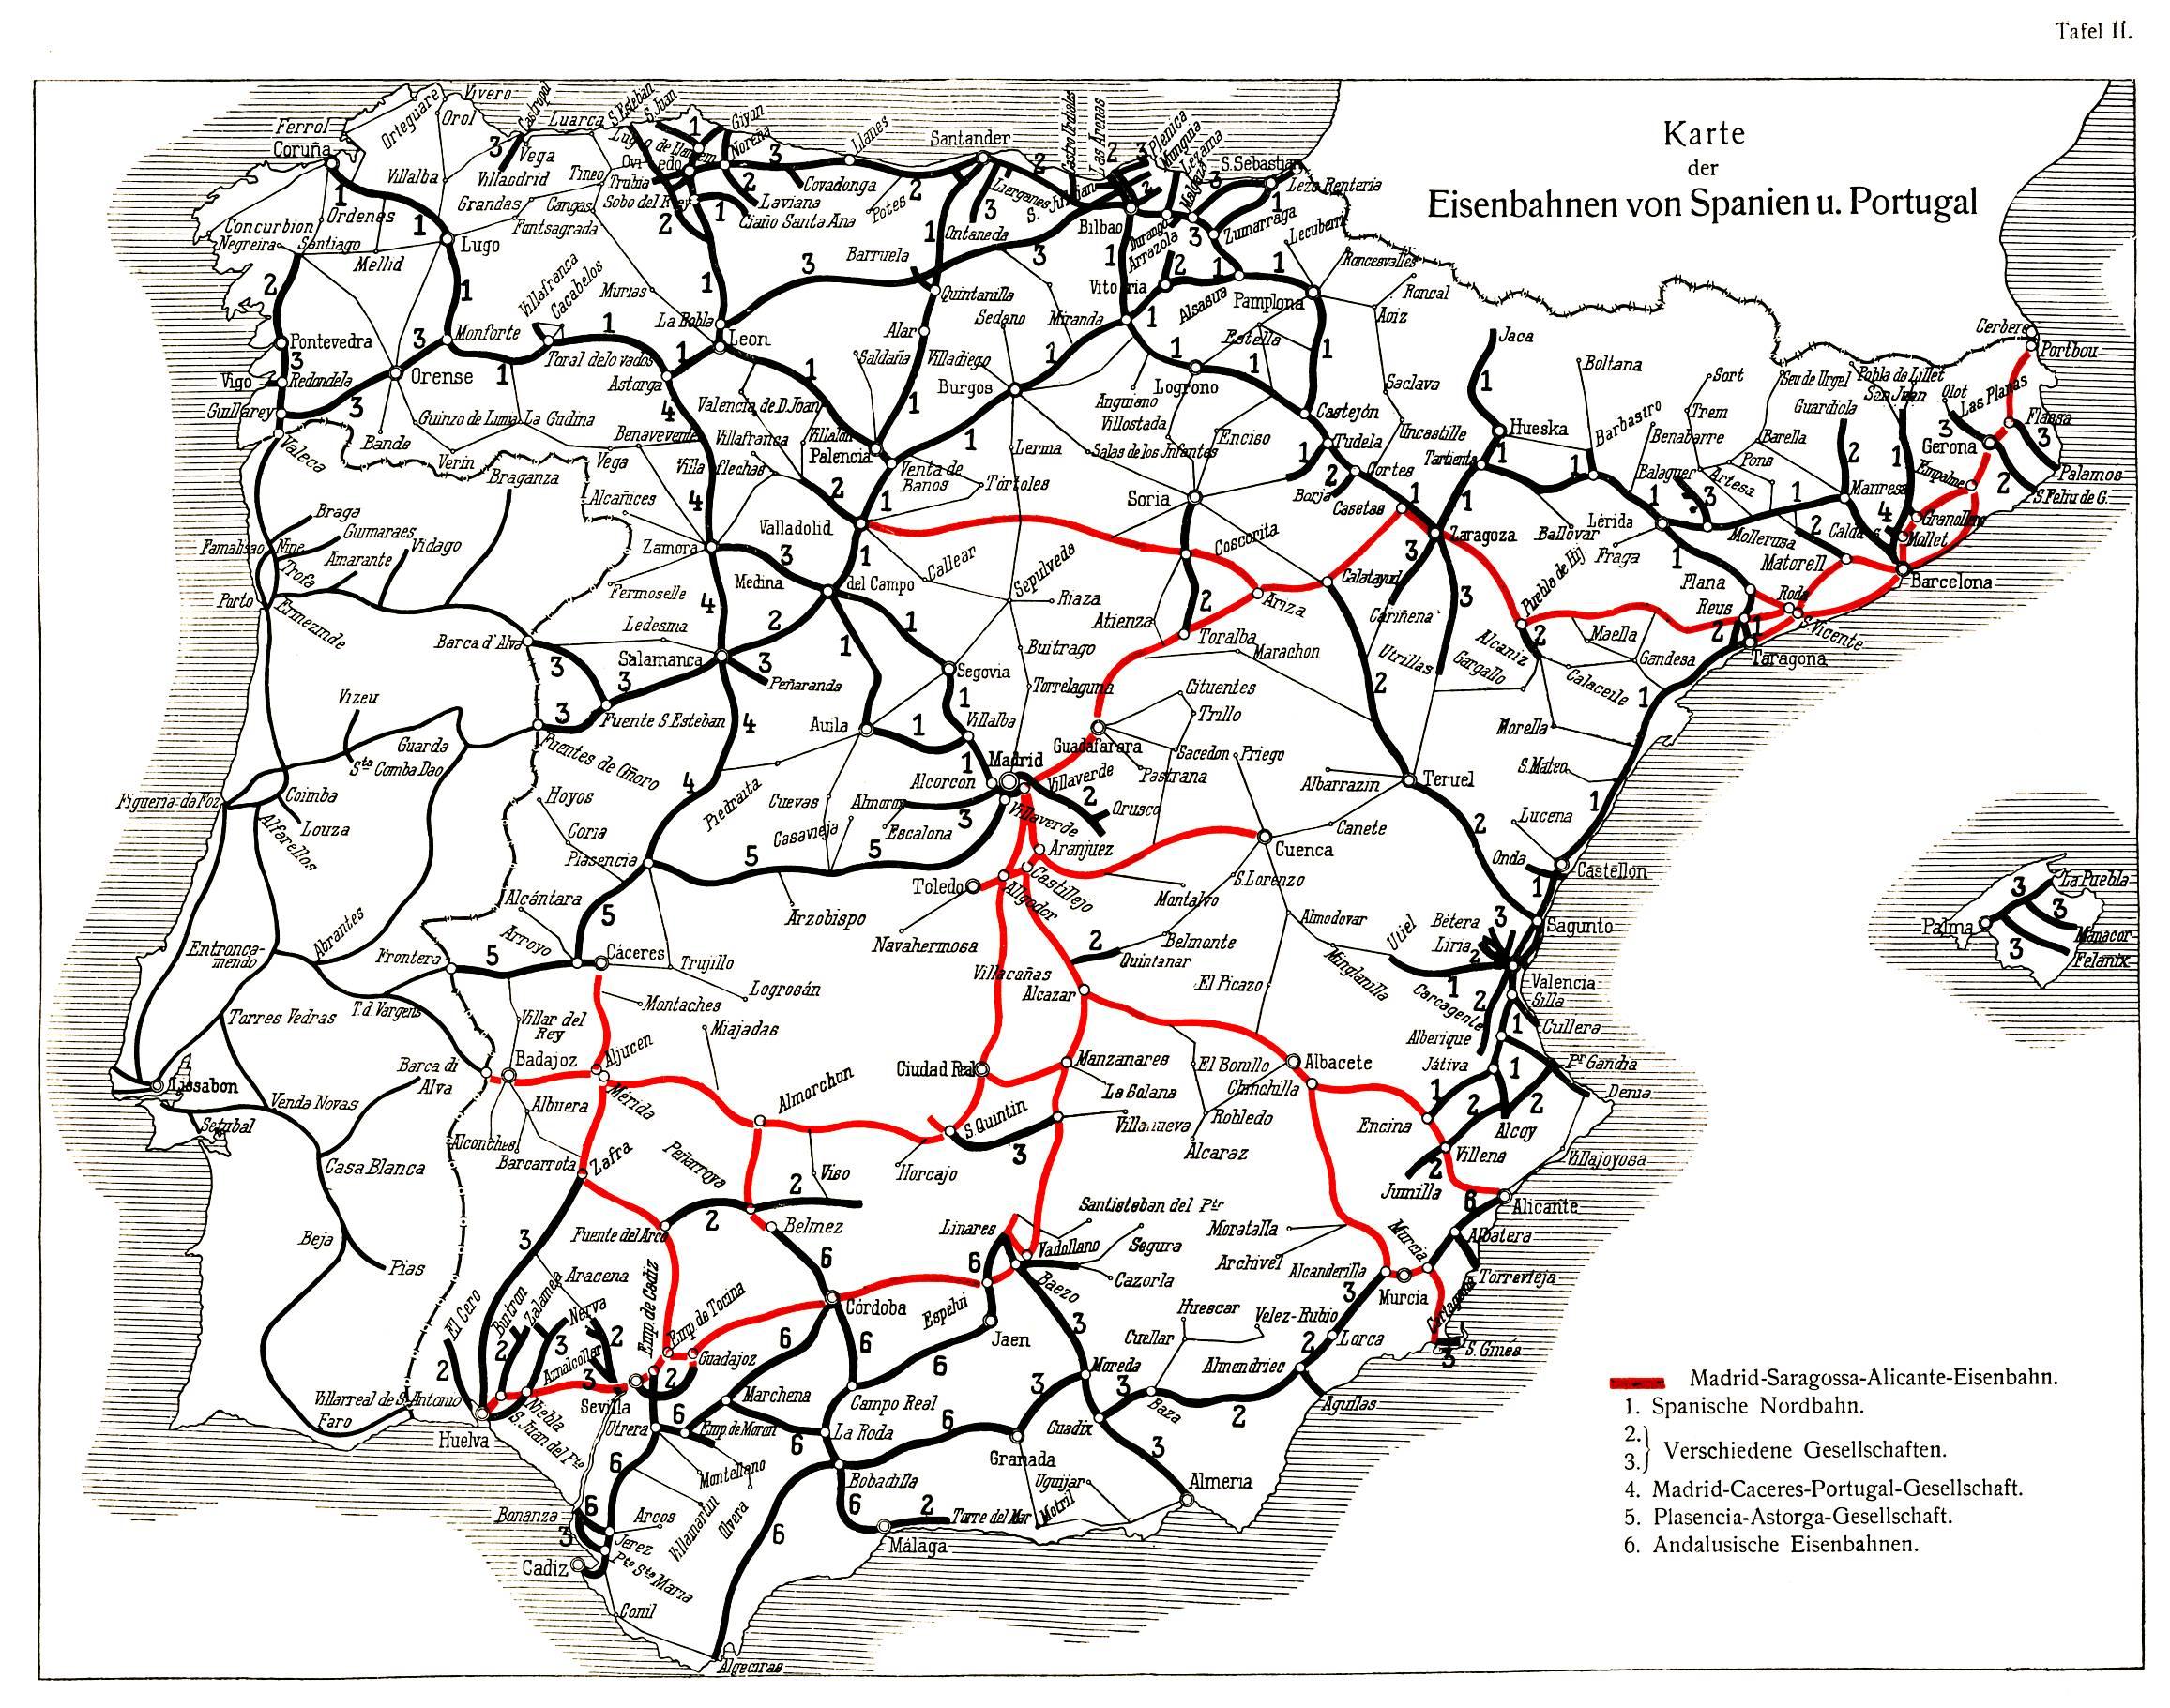 Spaın Traın Map Cataluña Rail Network Ave - Wikipedia